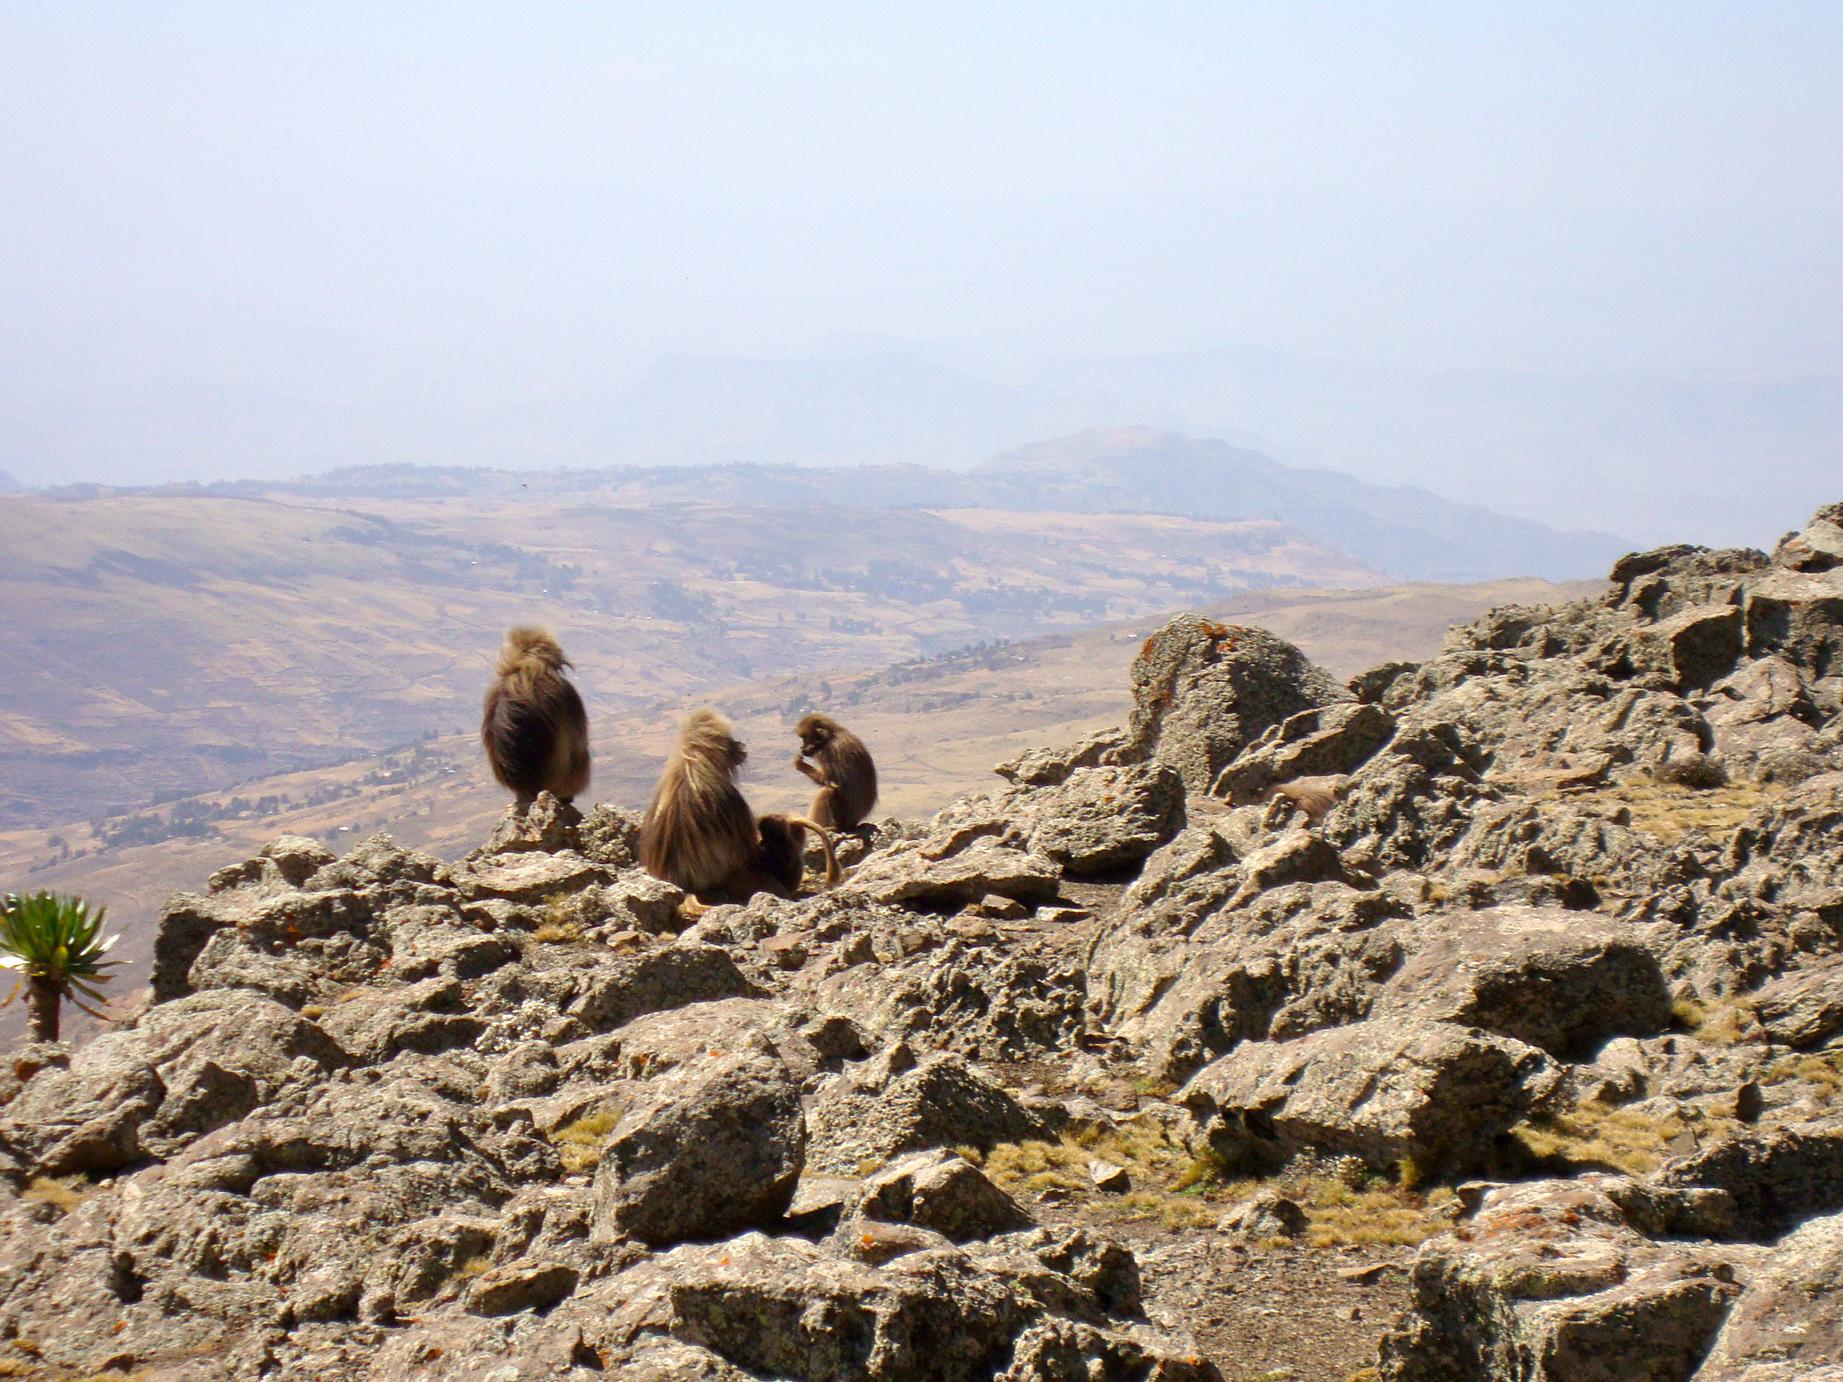 Buhawit Pass, Simien Mountains